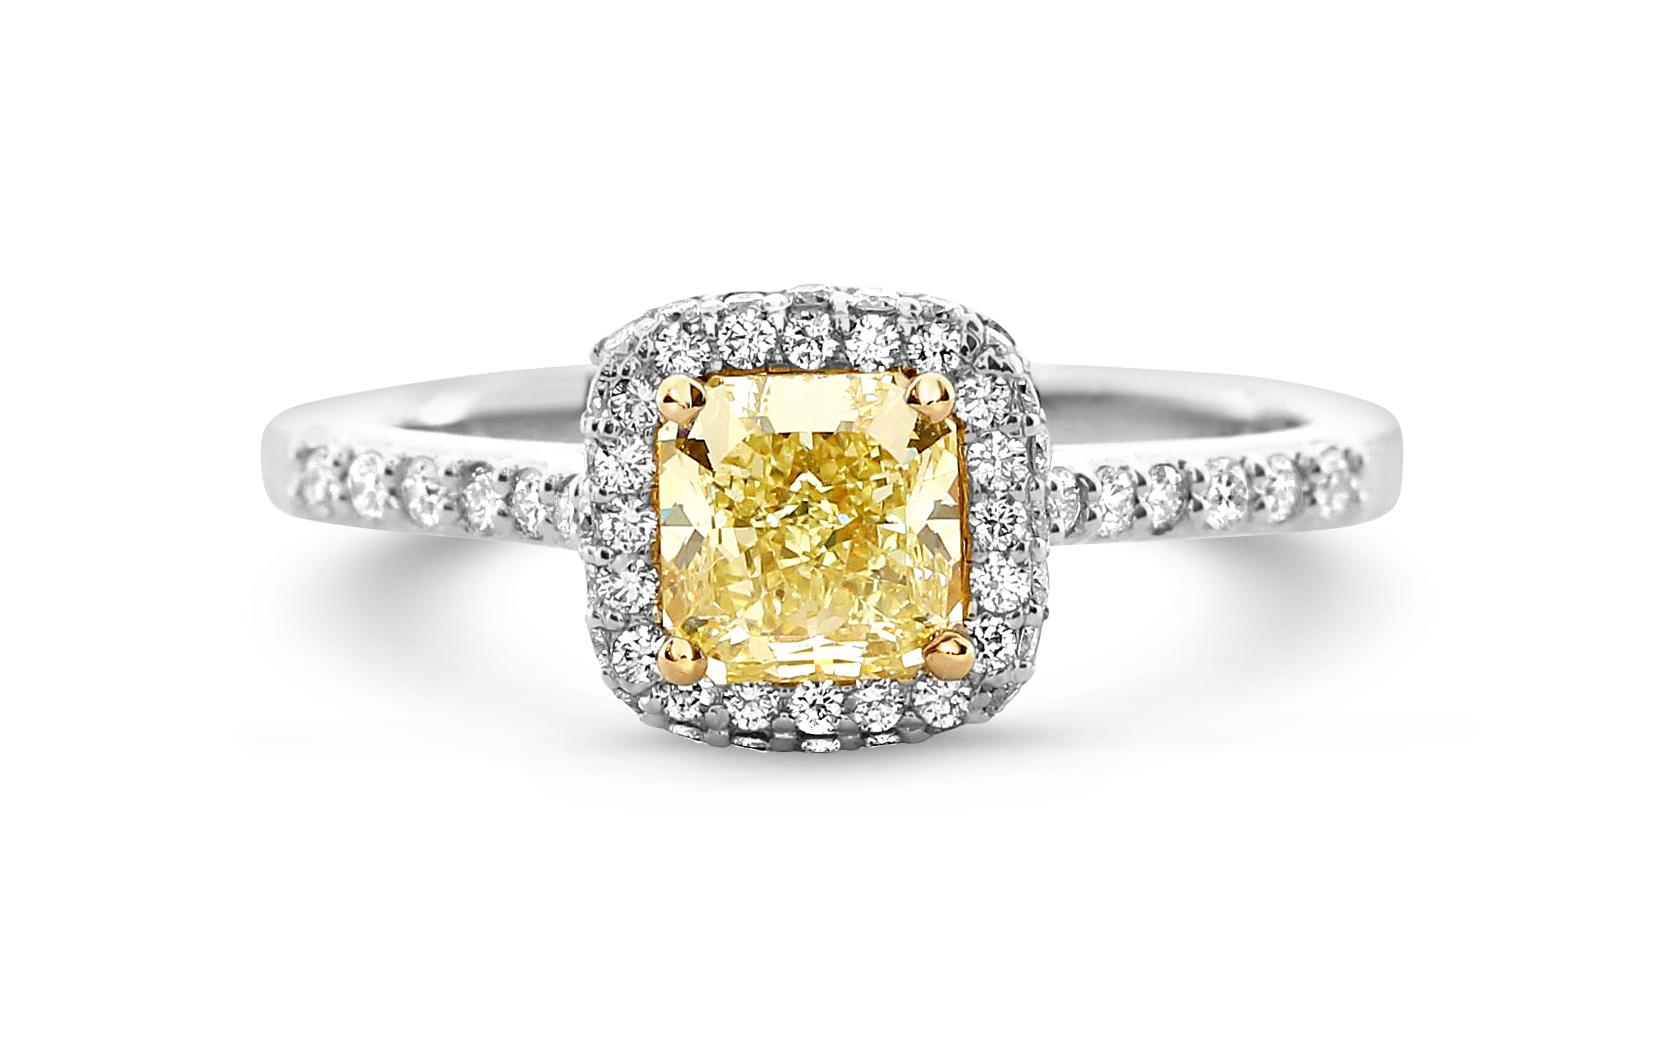 0 81 Ct Cushion Cut Vs2 Yellow Diamond Engagement Ring 18k